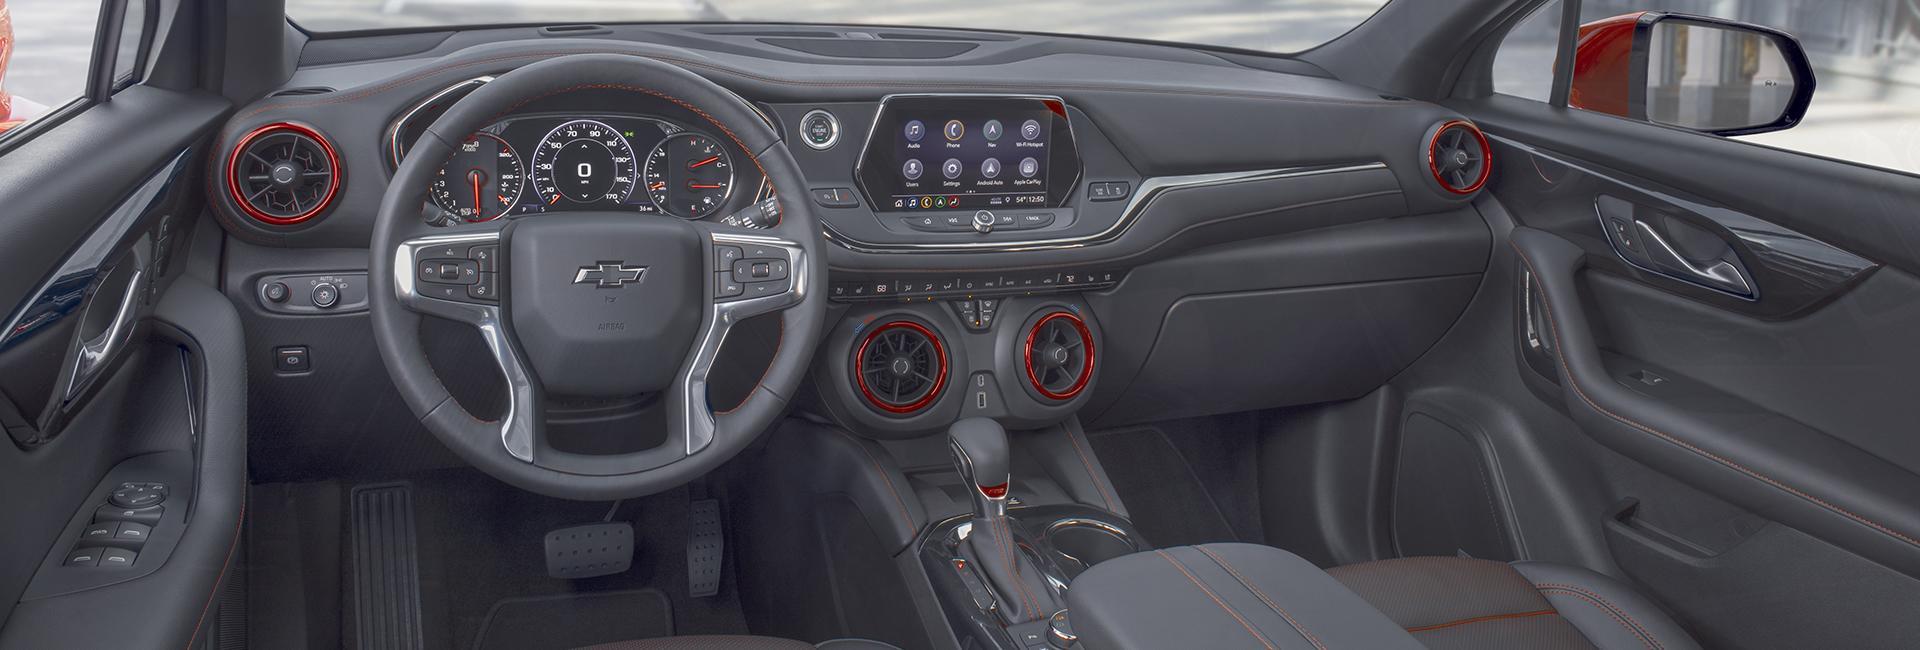 Chevrolet Blazer Interior